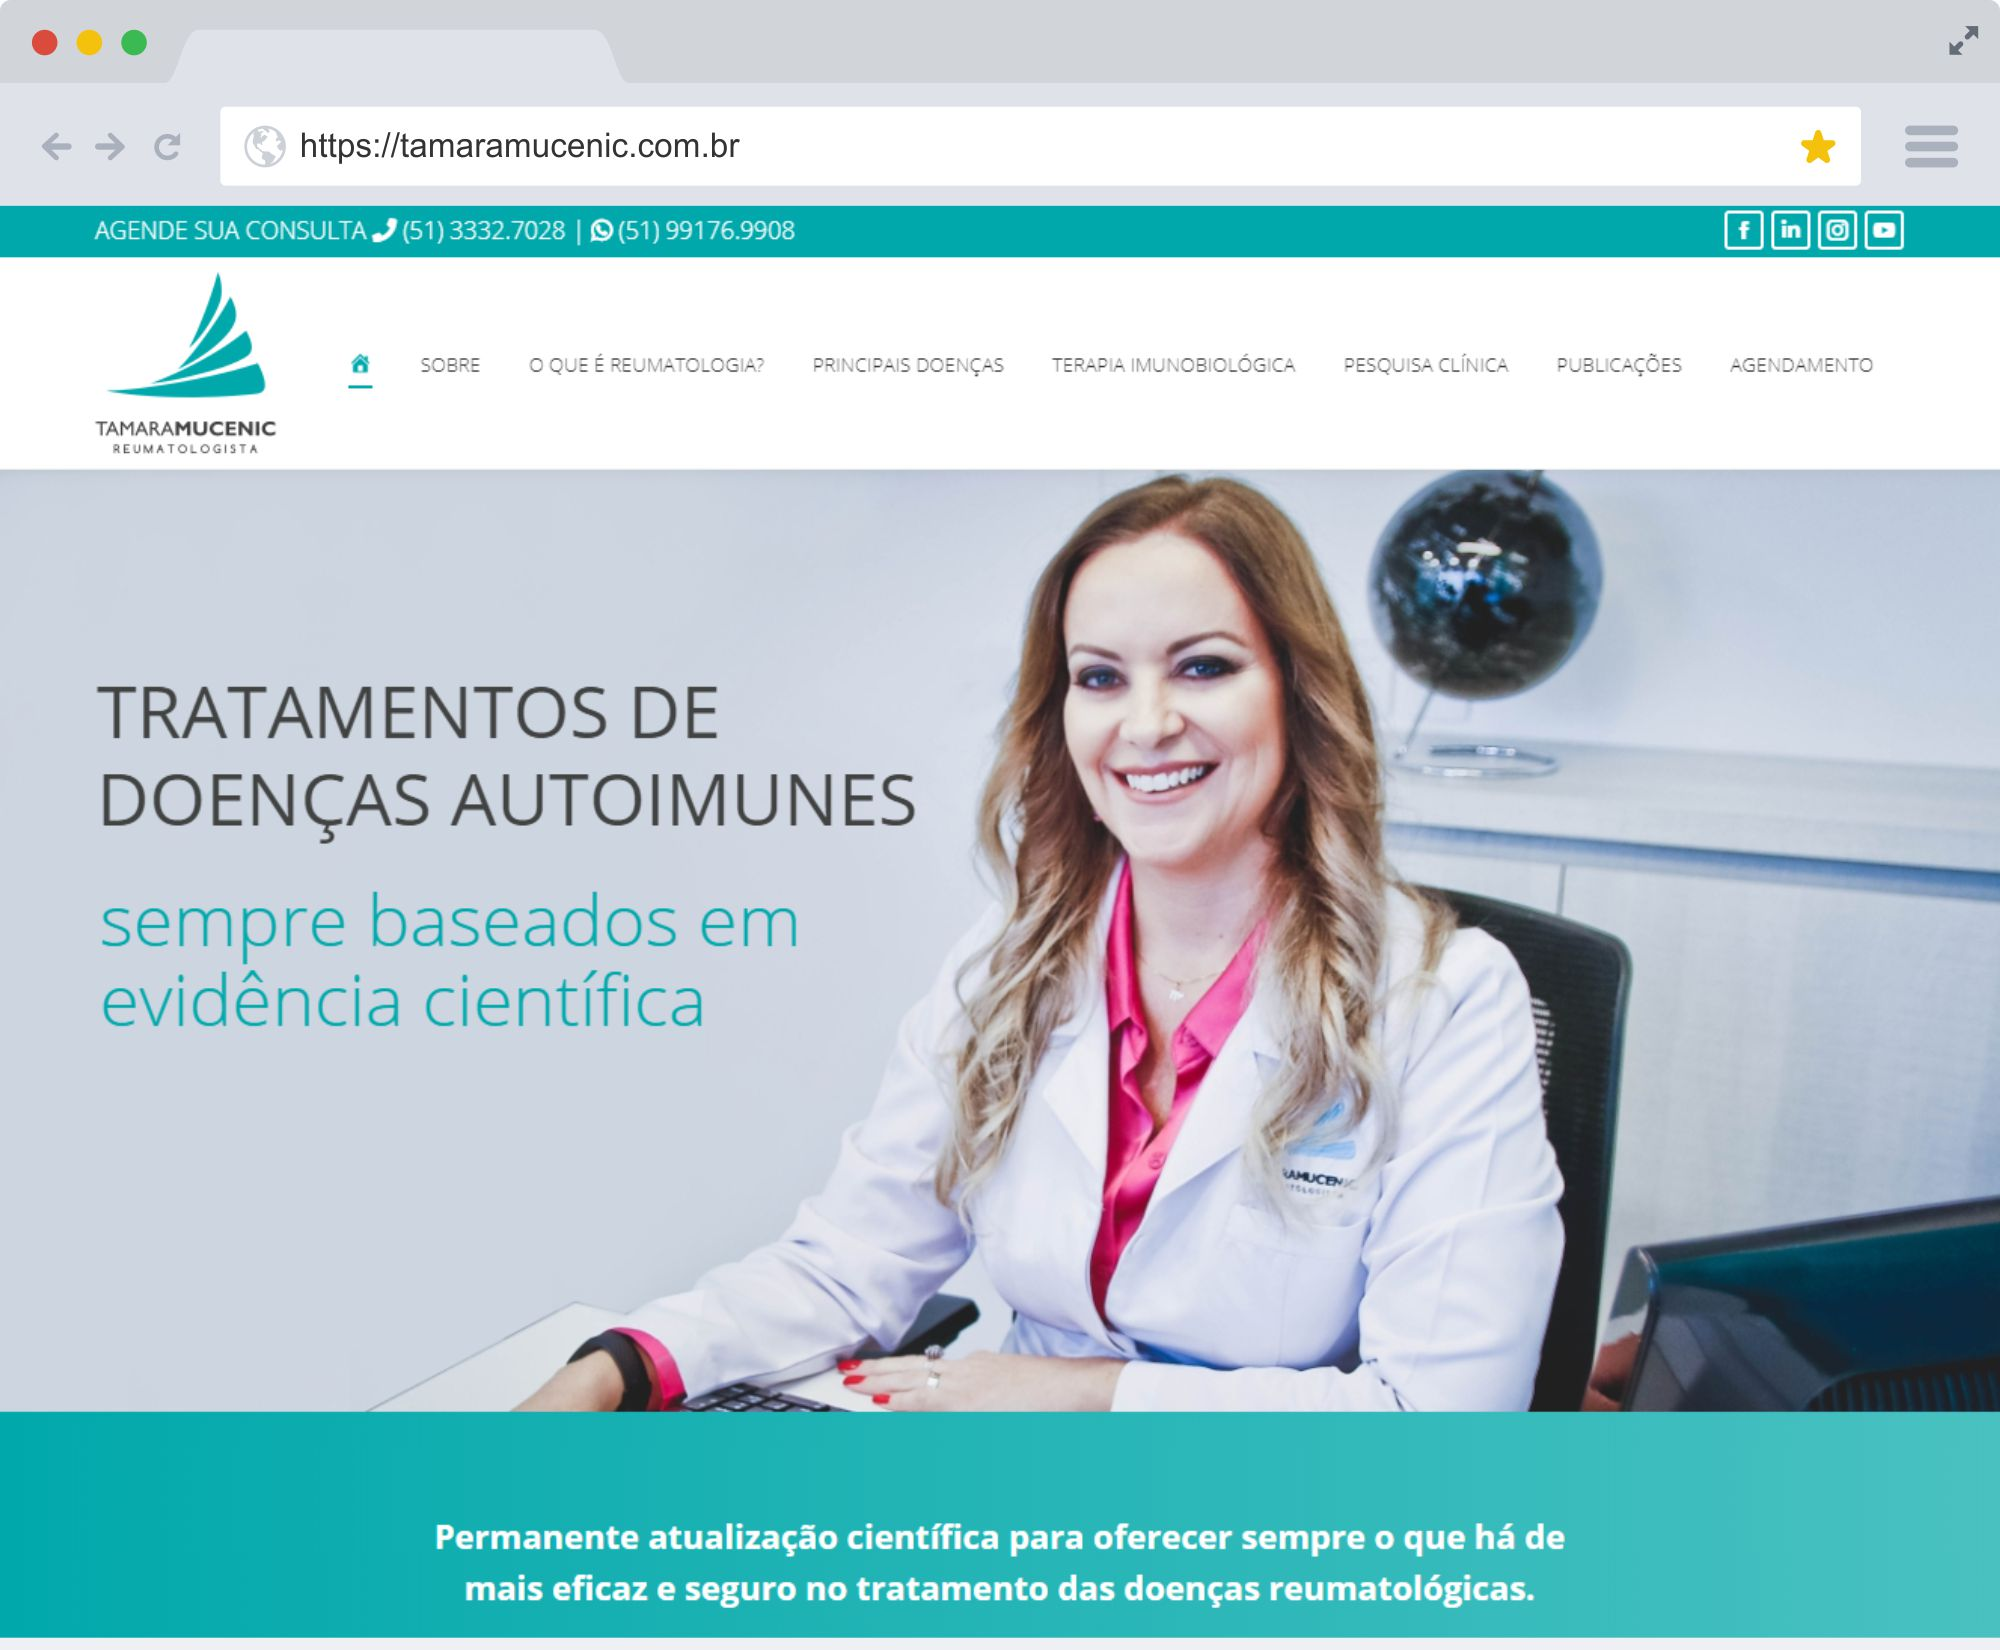 tamaramucenic.com.br